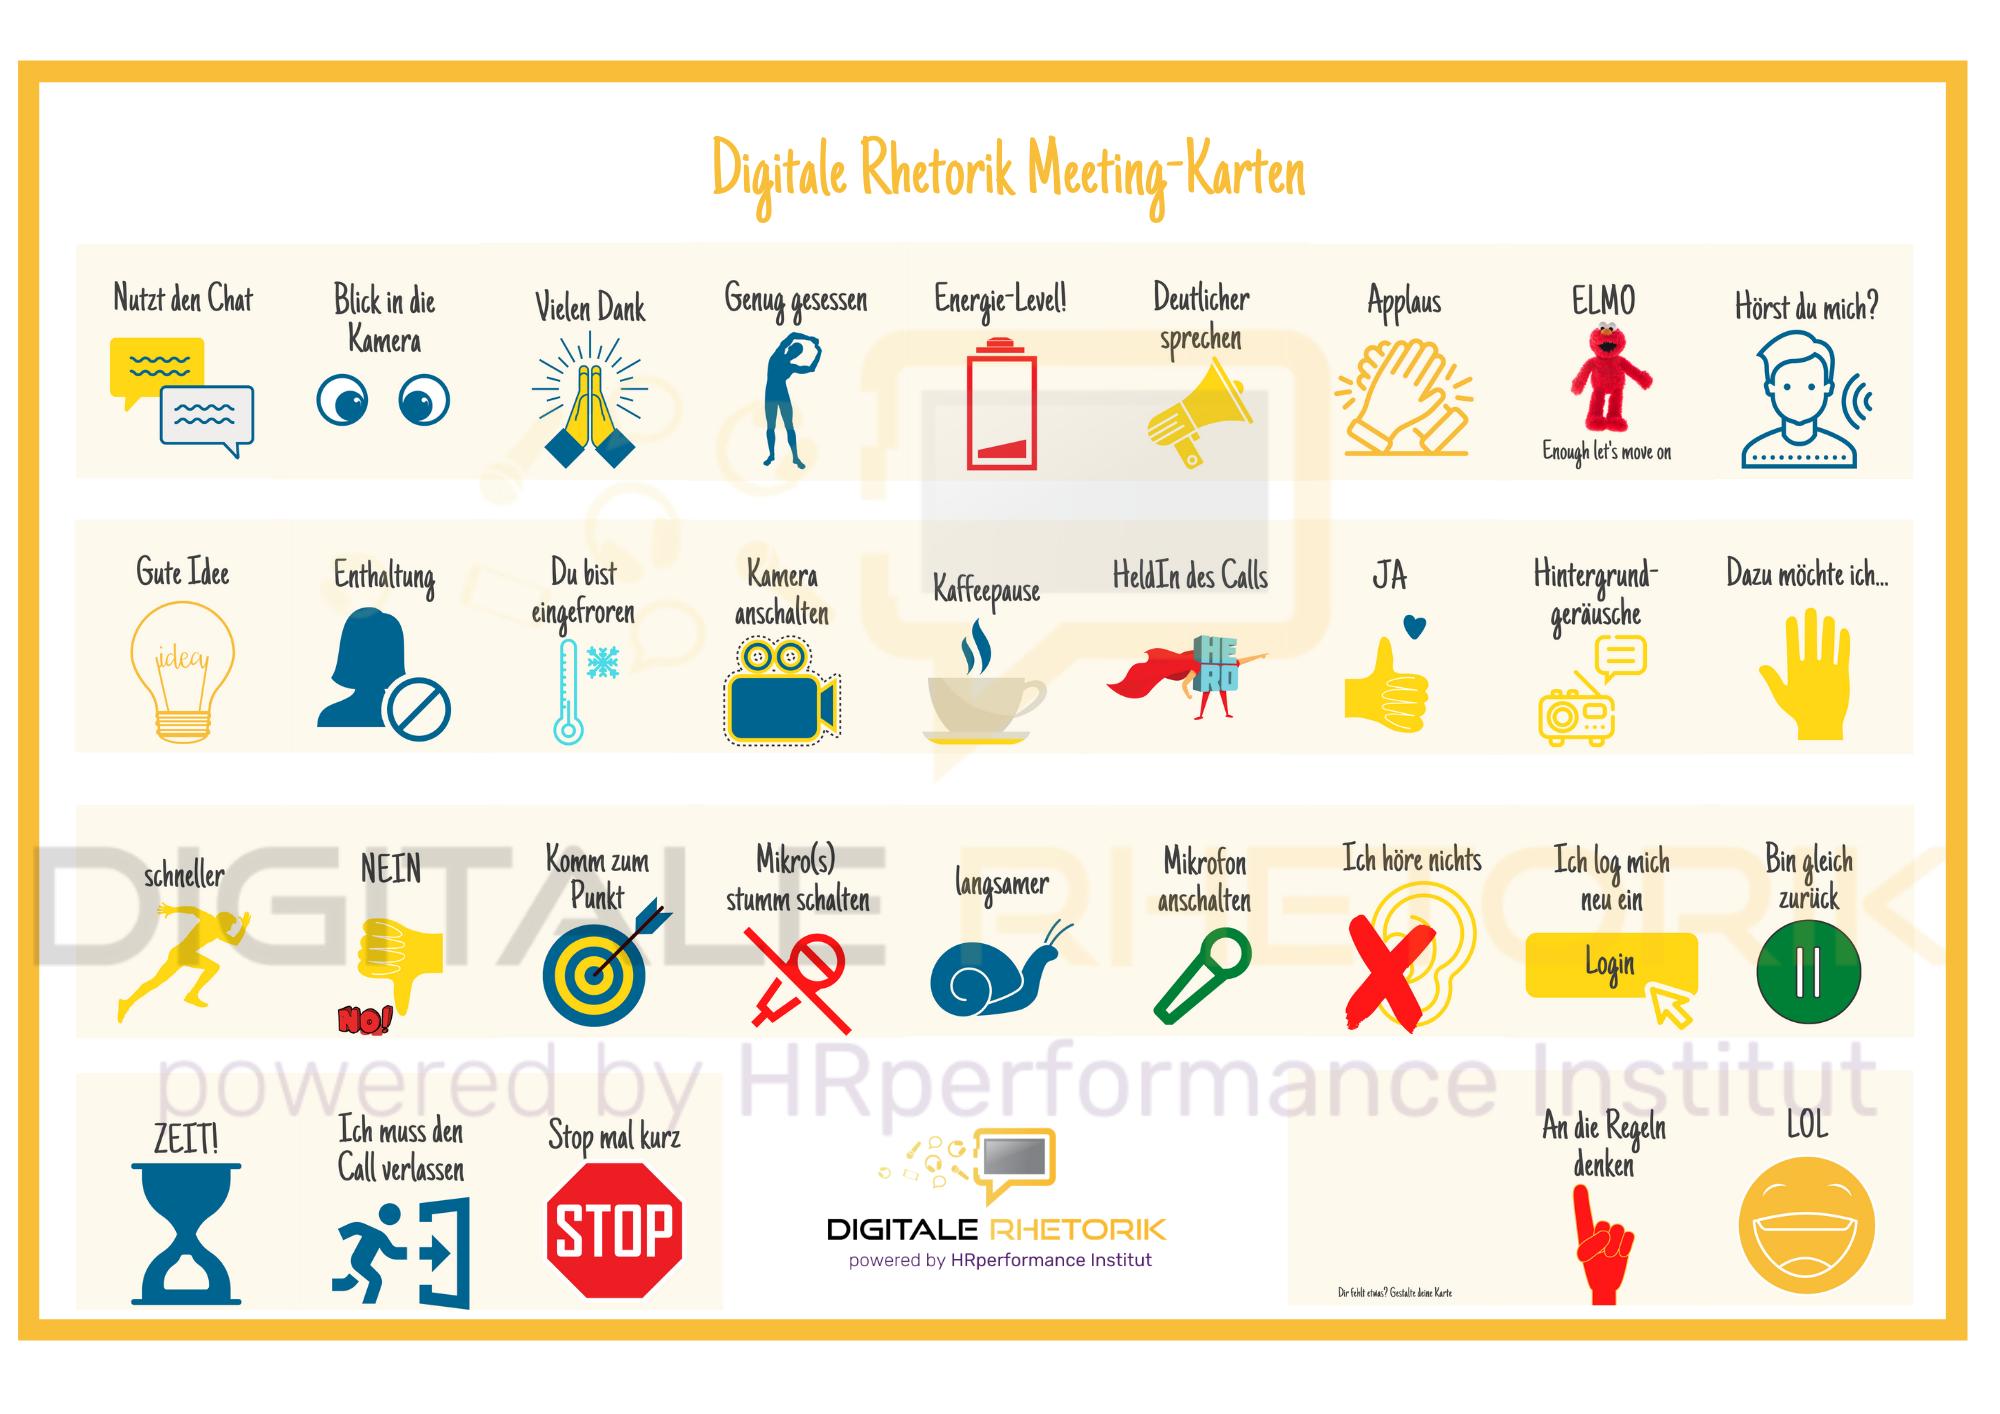 Digitale Rhetorik Meeting Karten